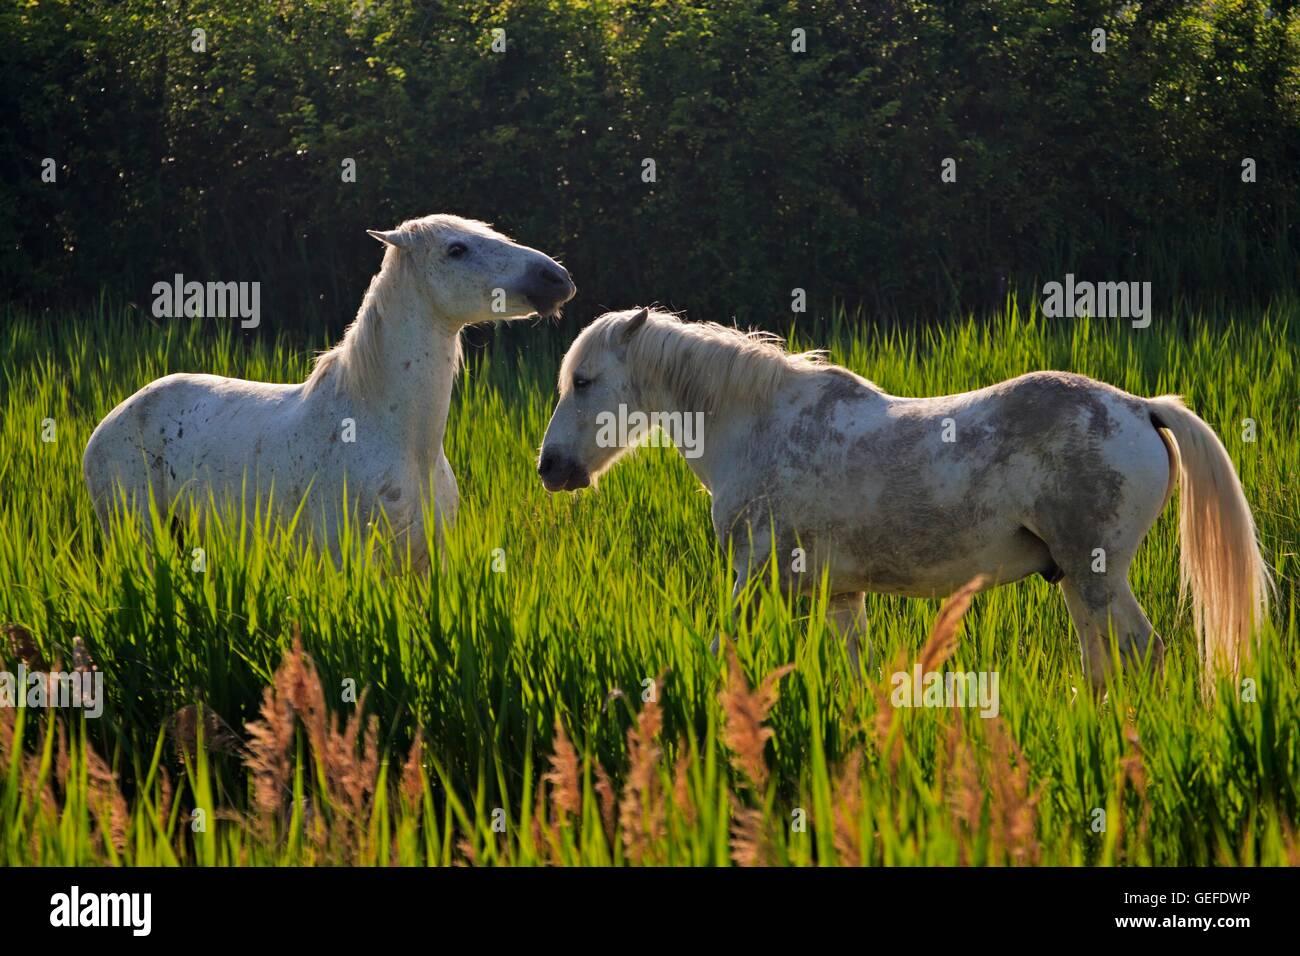 Zoology Animals Mammal Mammalian Equus Stock Photos